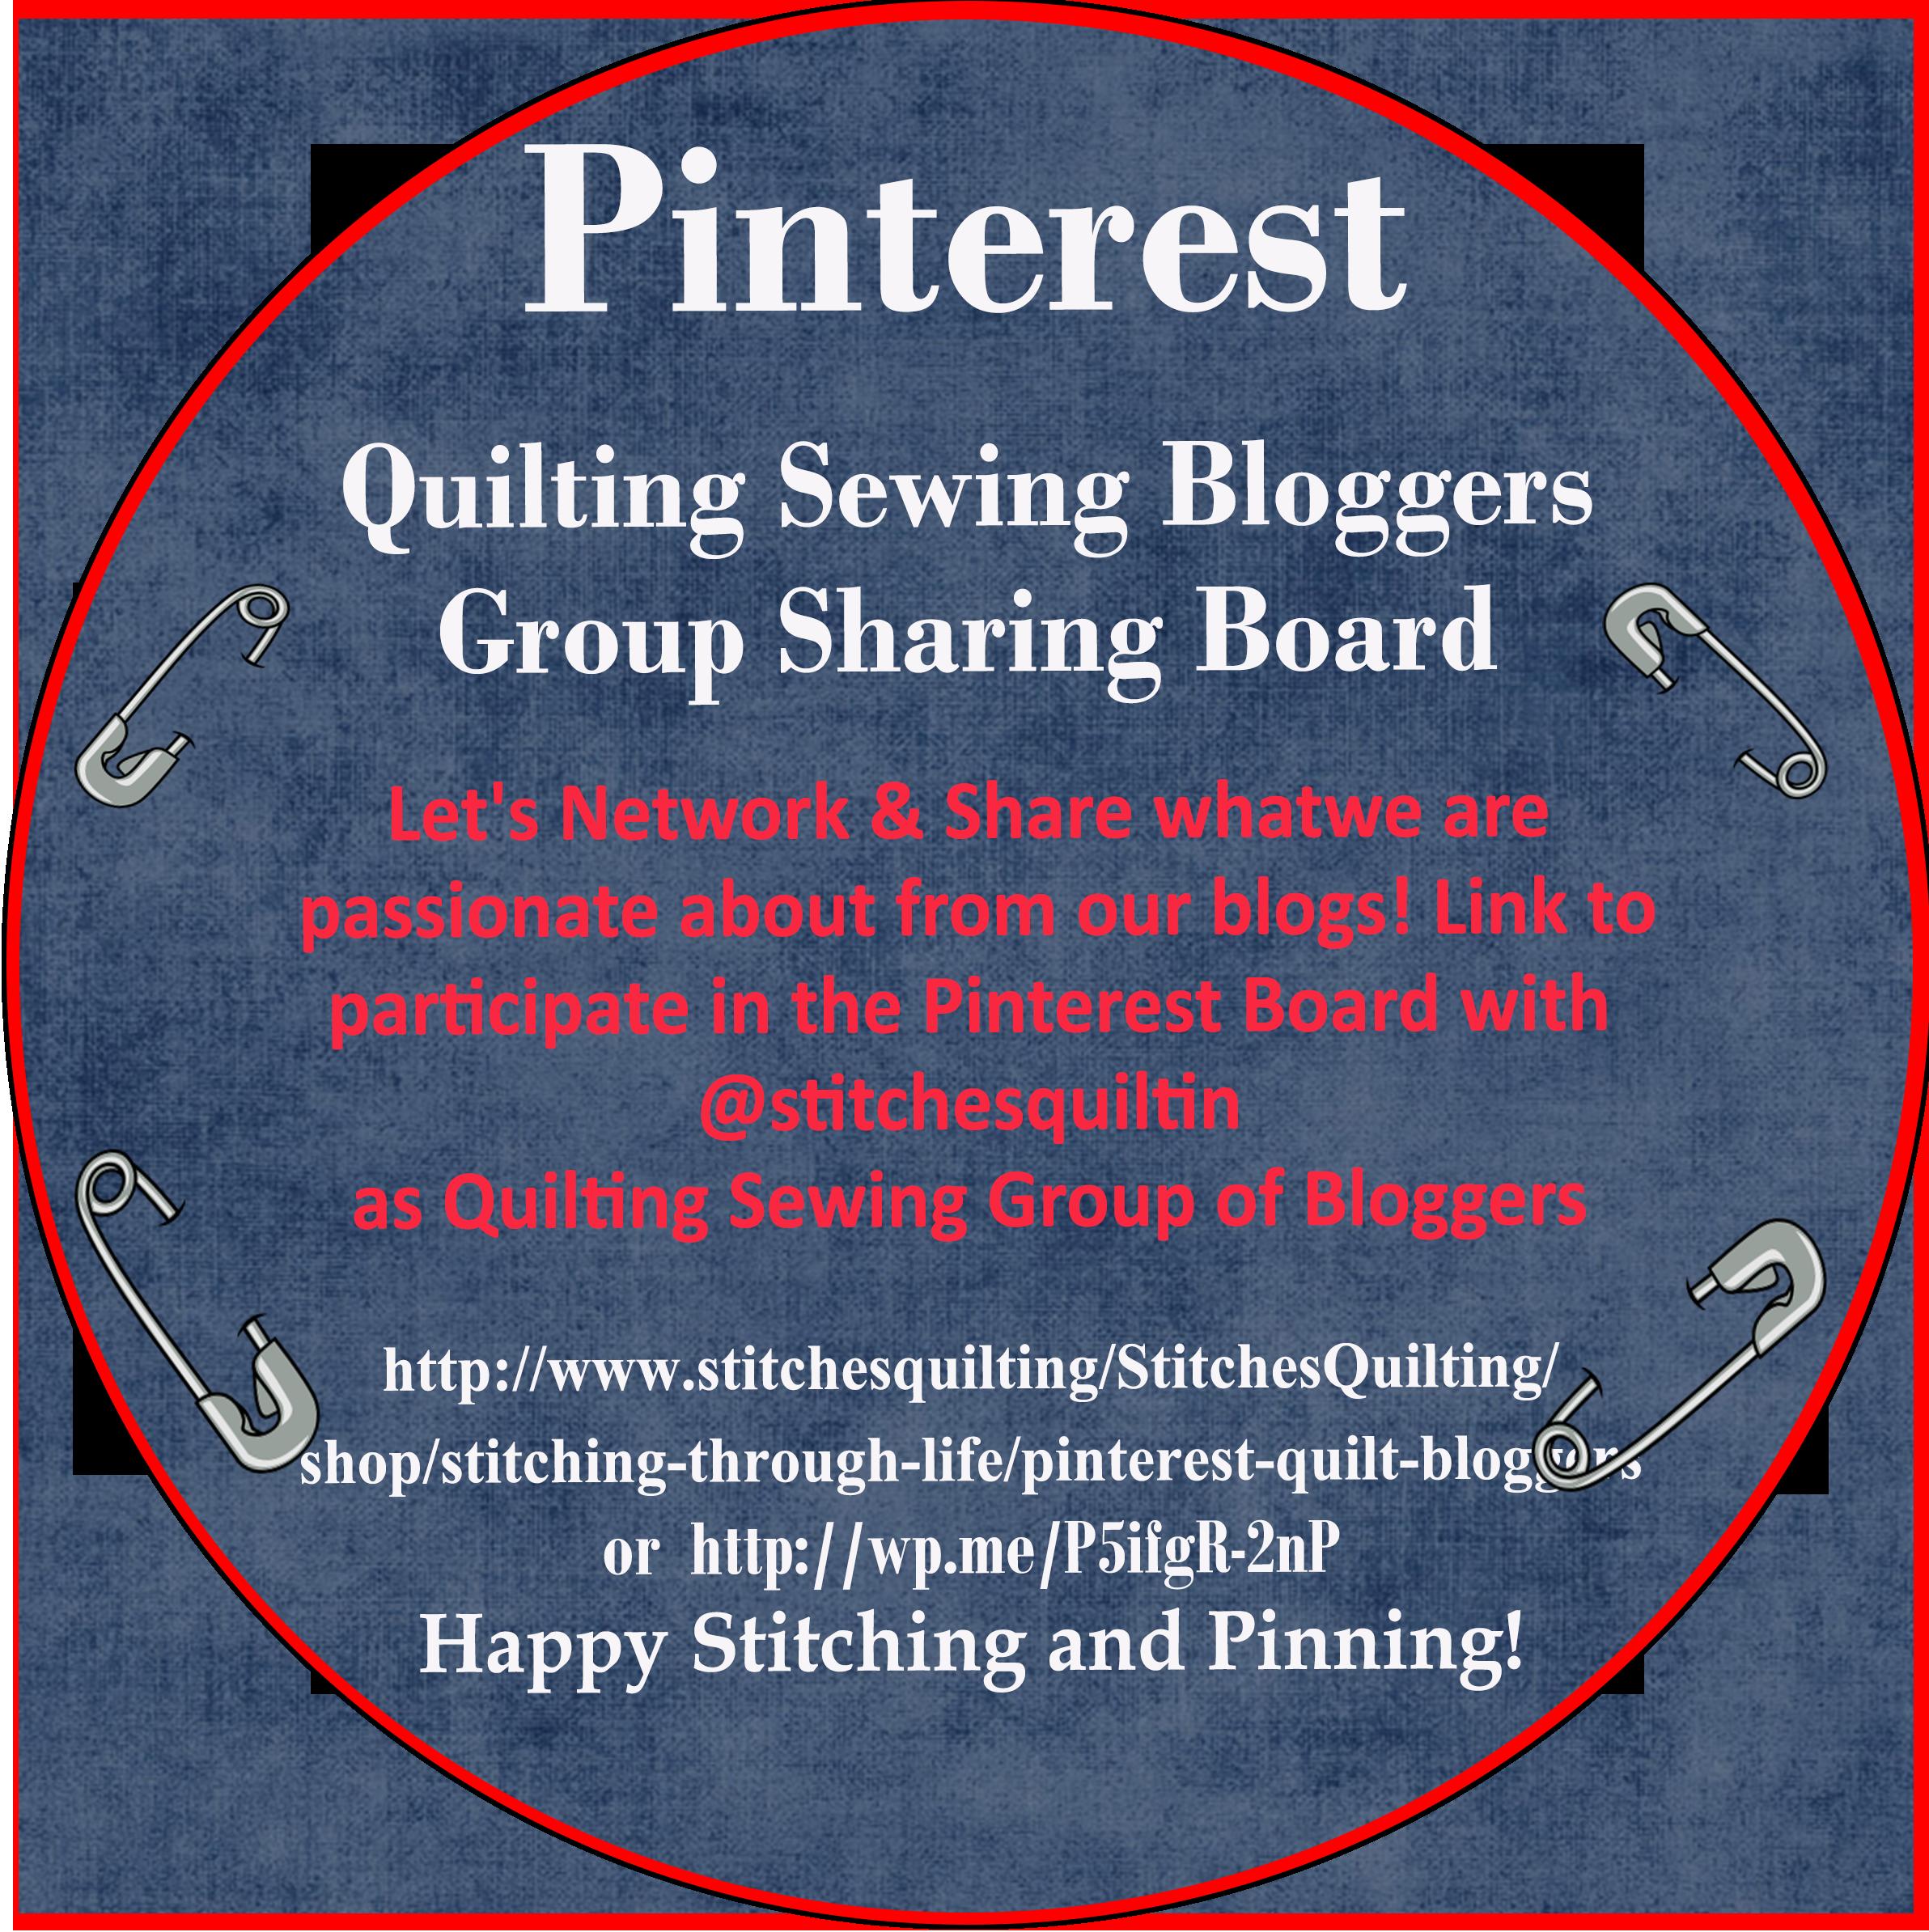 Pinterest-Quilt-Blogger Group